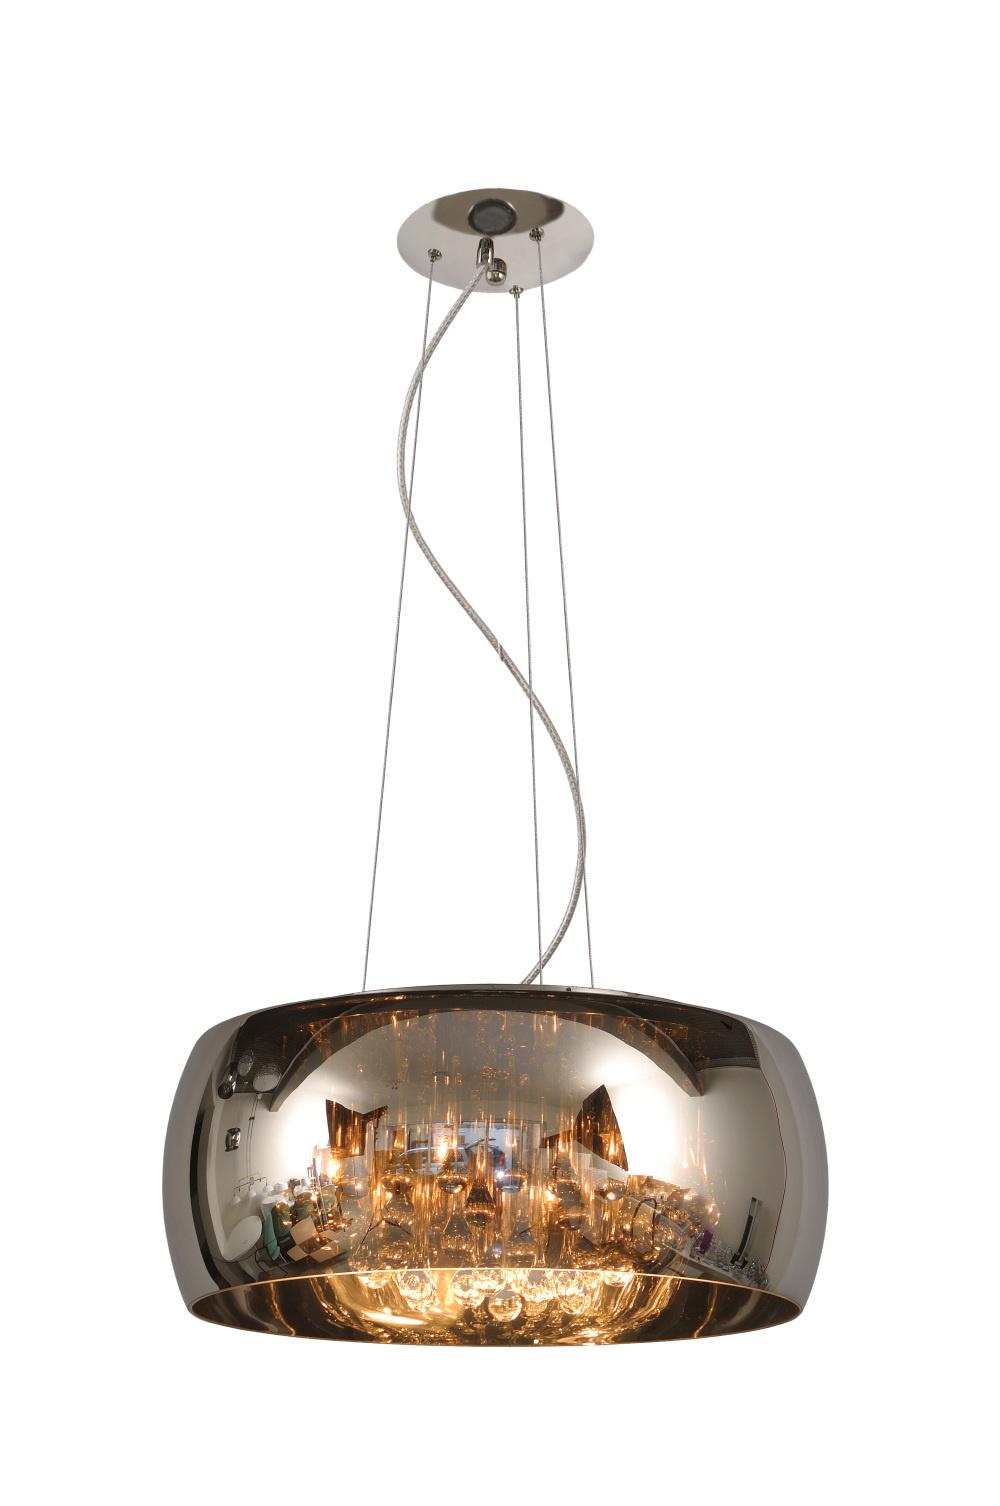 Lucide PEARL Hanglamp-Chroom-Ø50-6xG9-28W-Glas